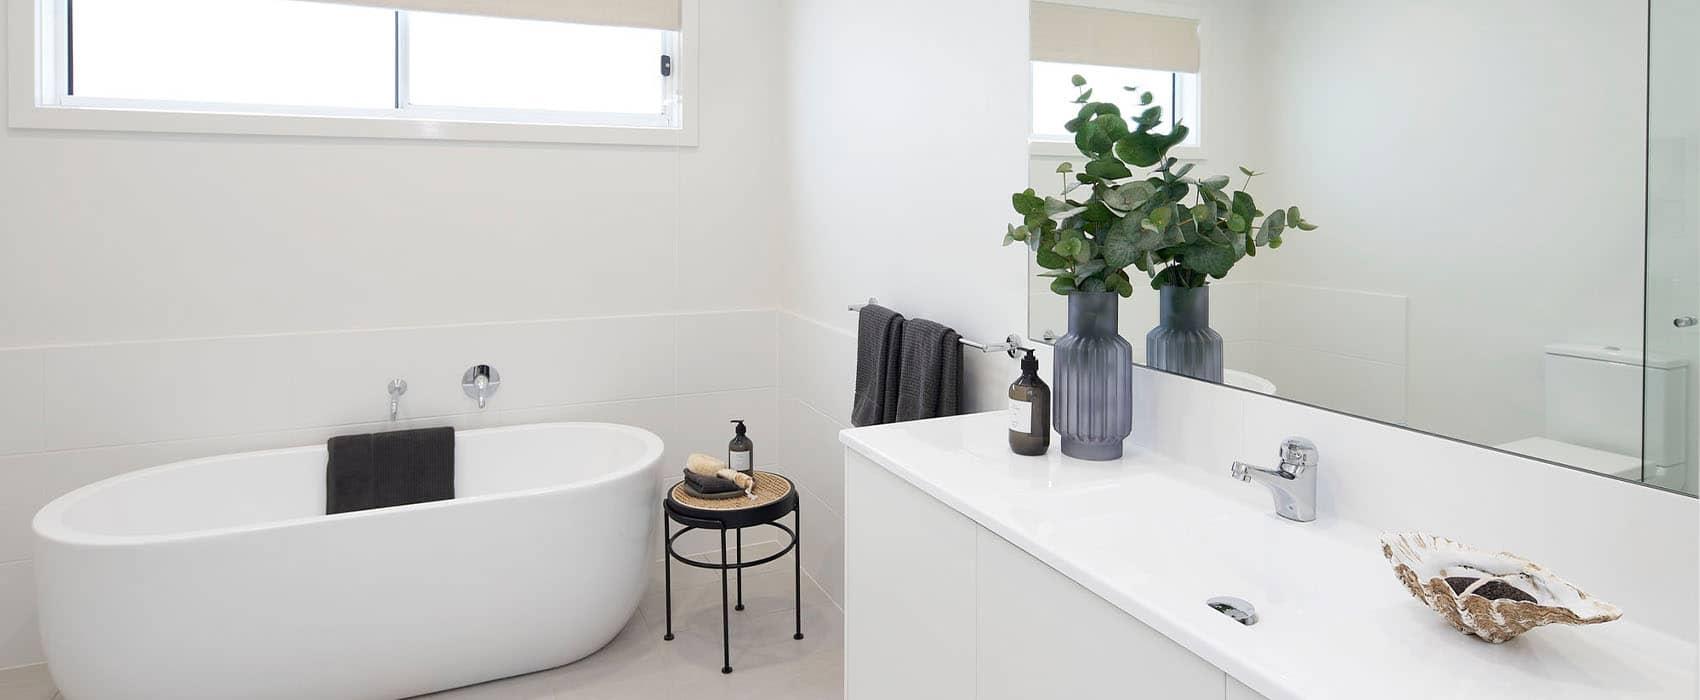 masterton-malibu29-northhampton_bathroom_02 Interior